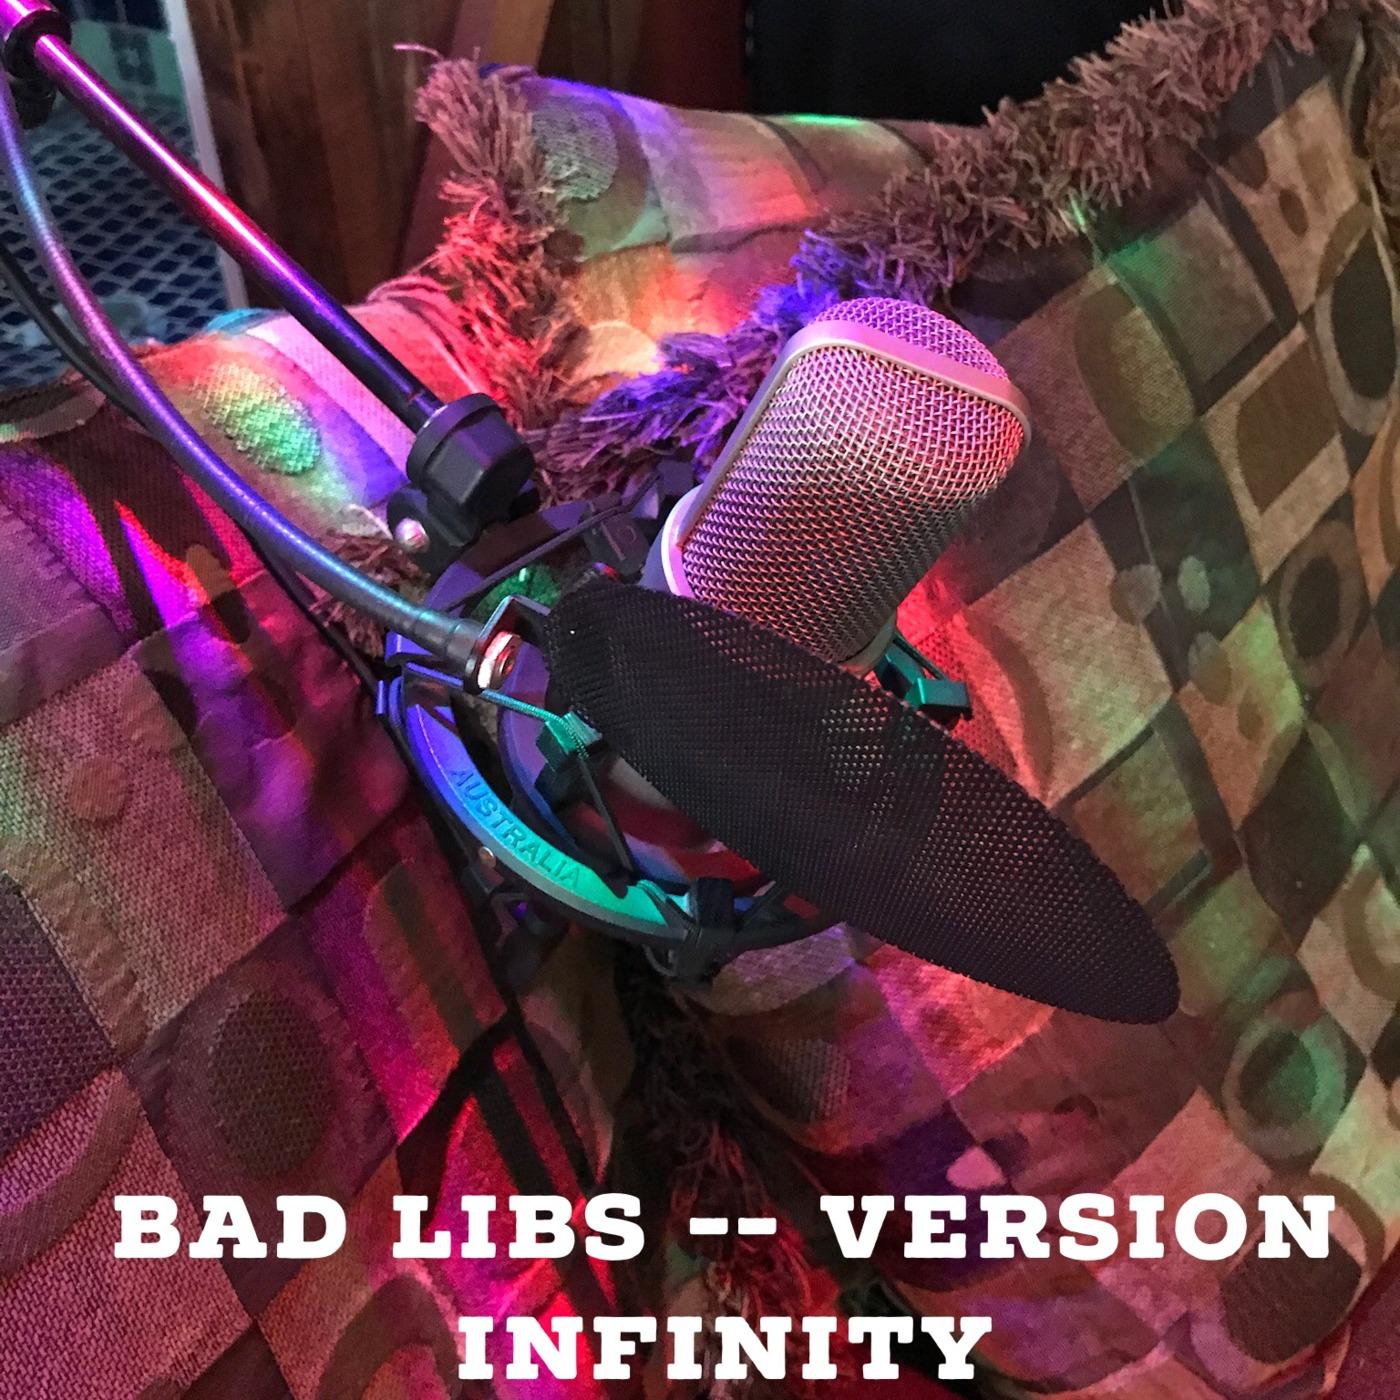 Bad Libs - Version Infinity